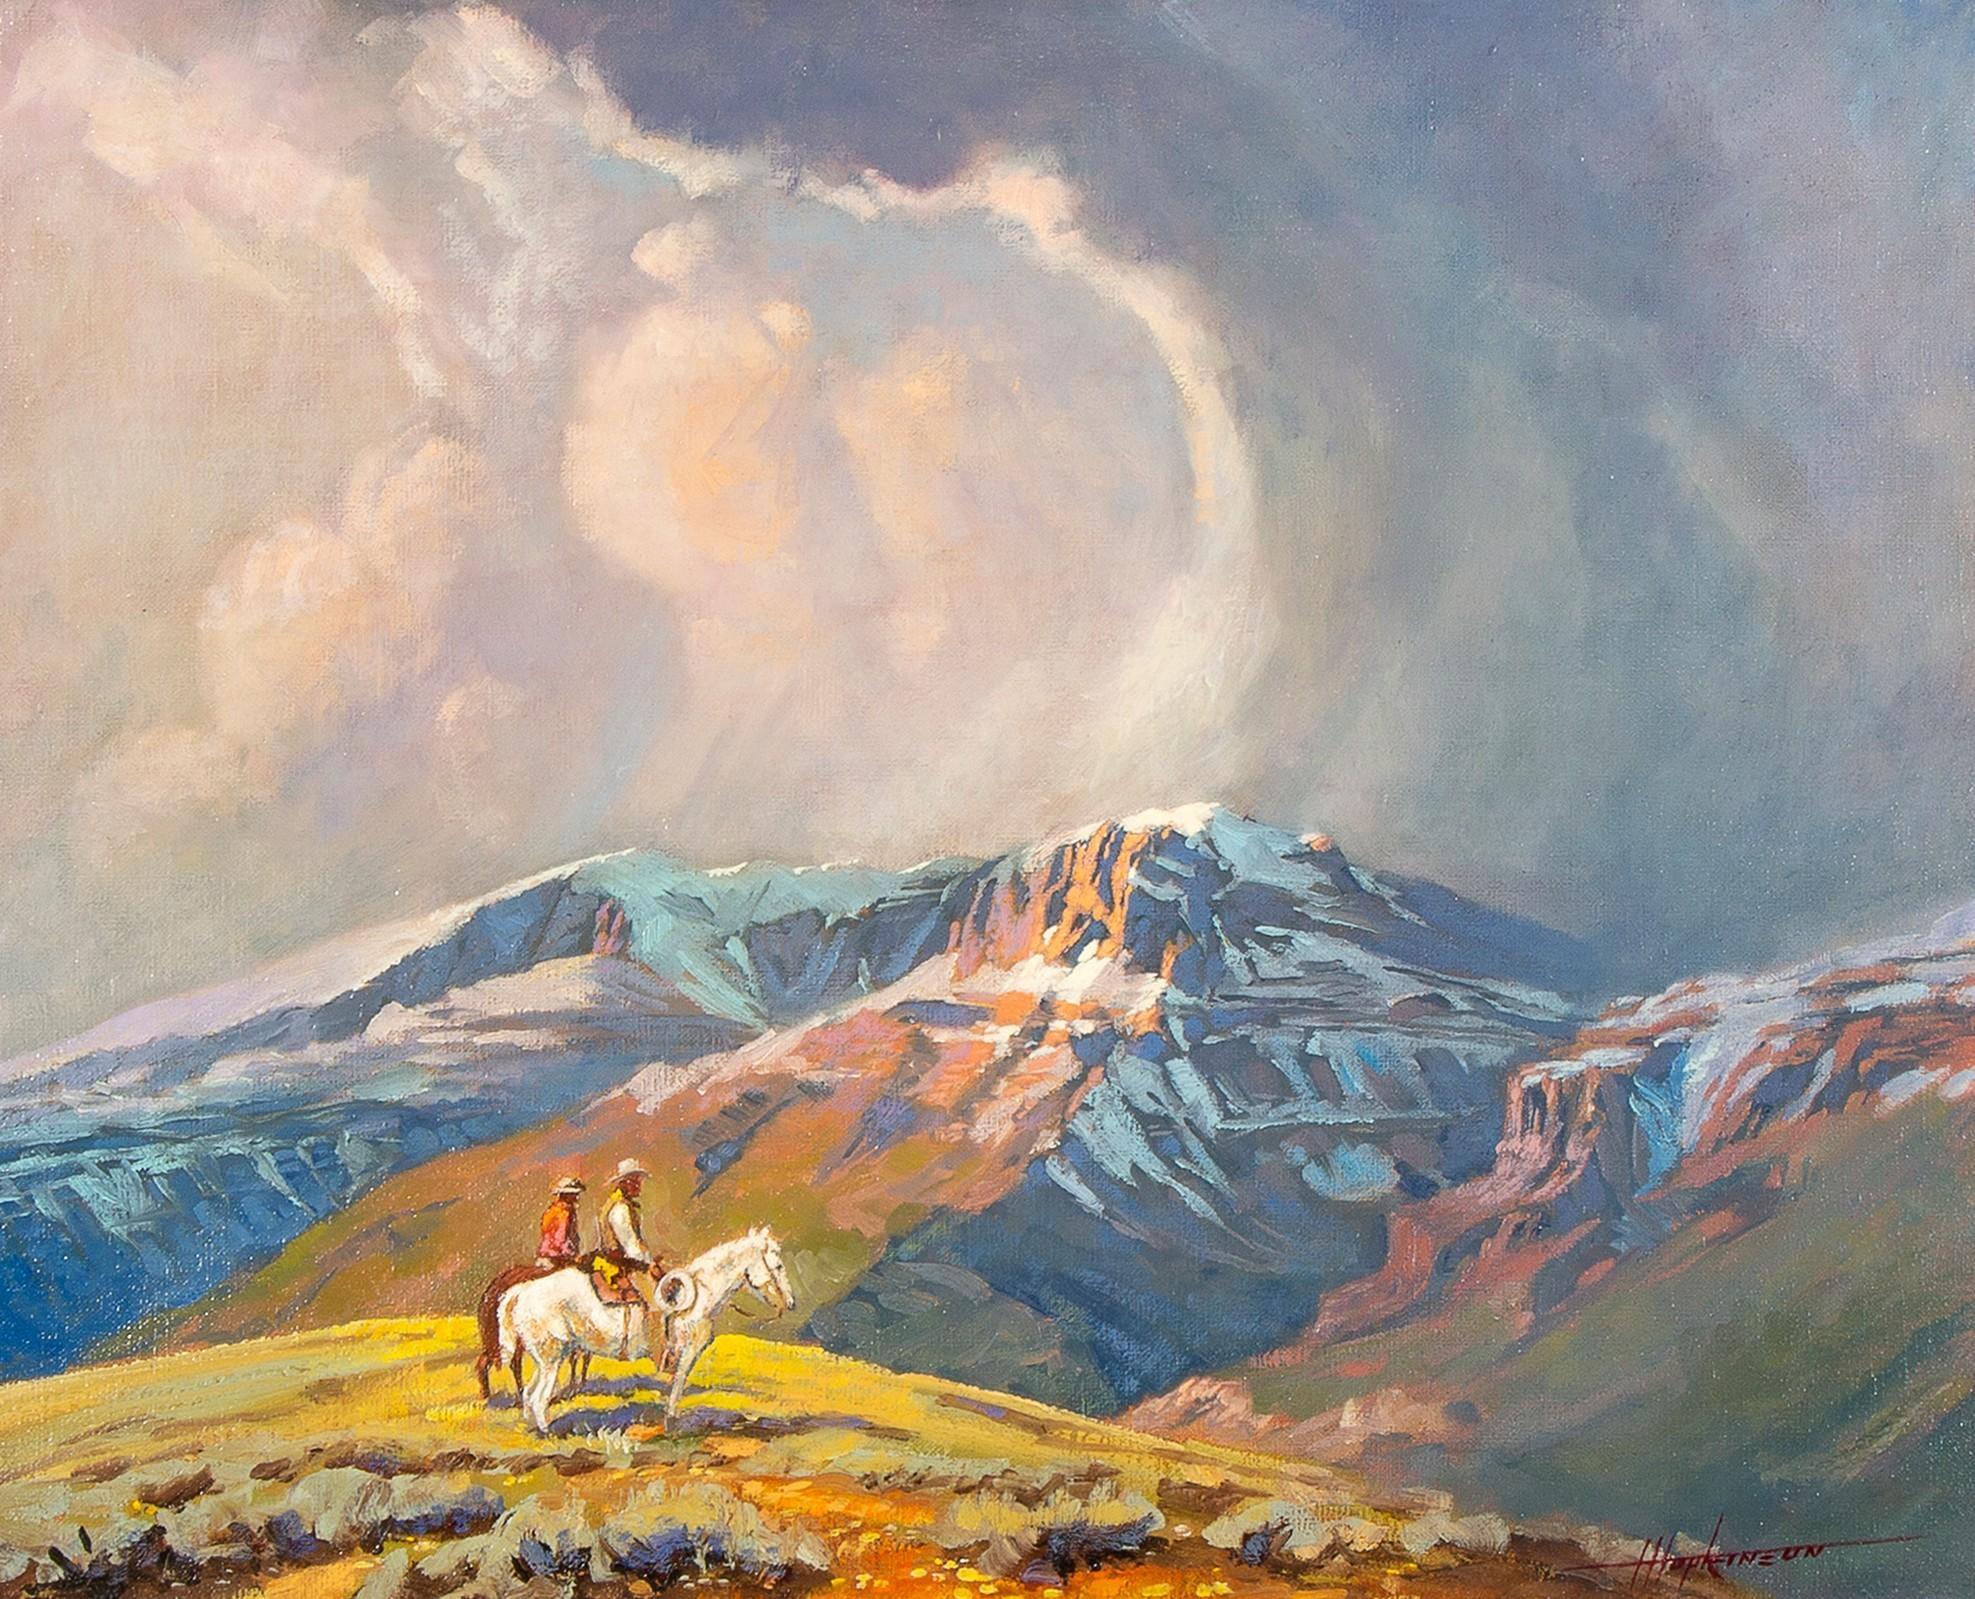 Harold Hopkinson, Threatening Sky, 1974